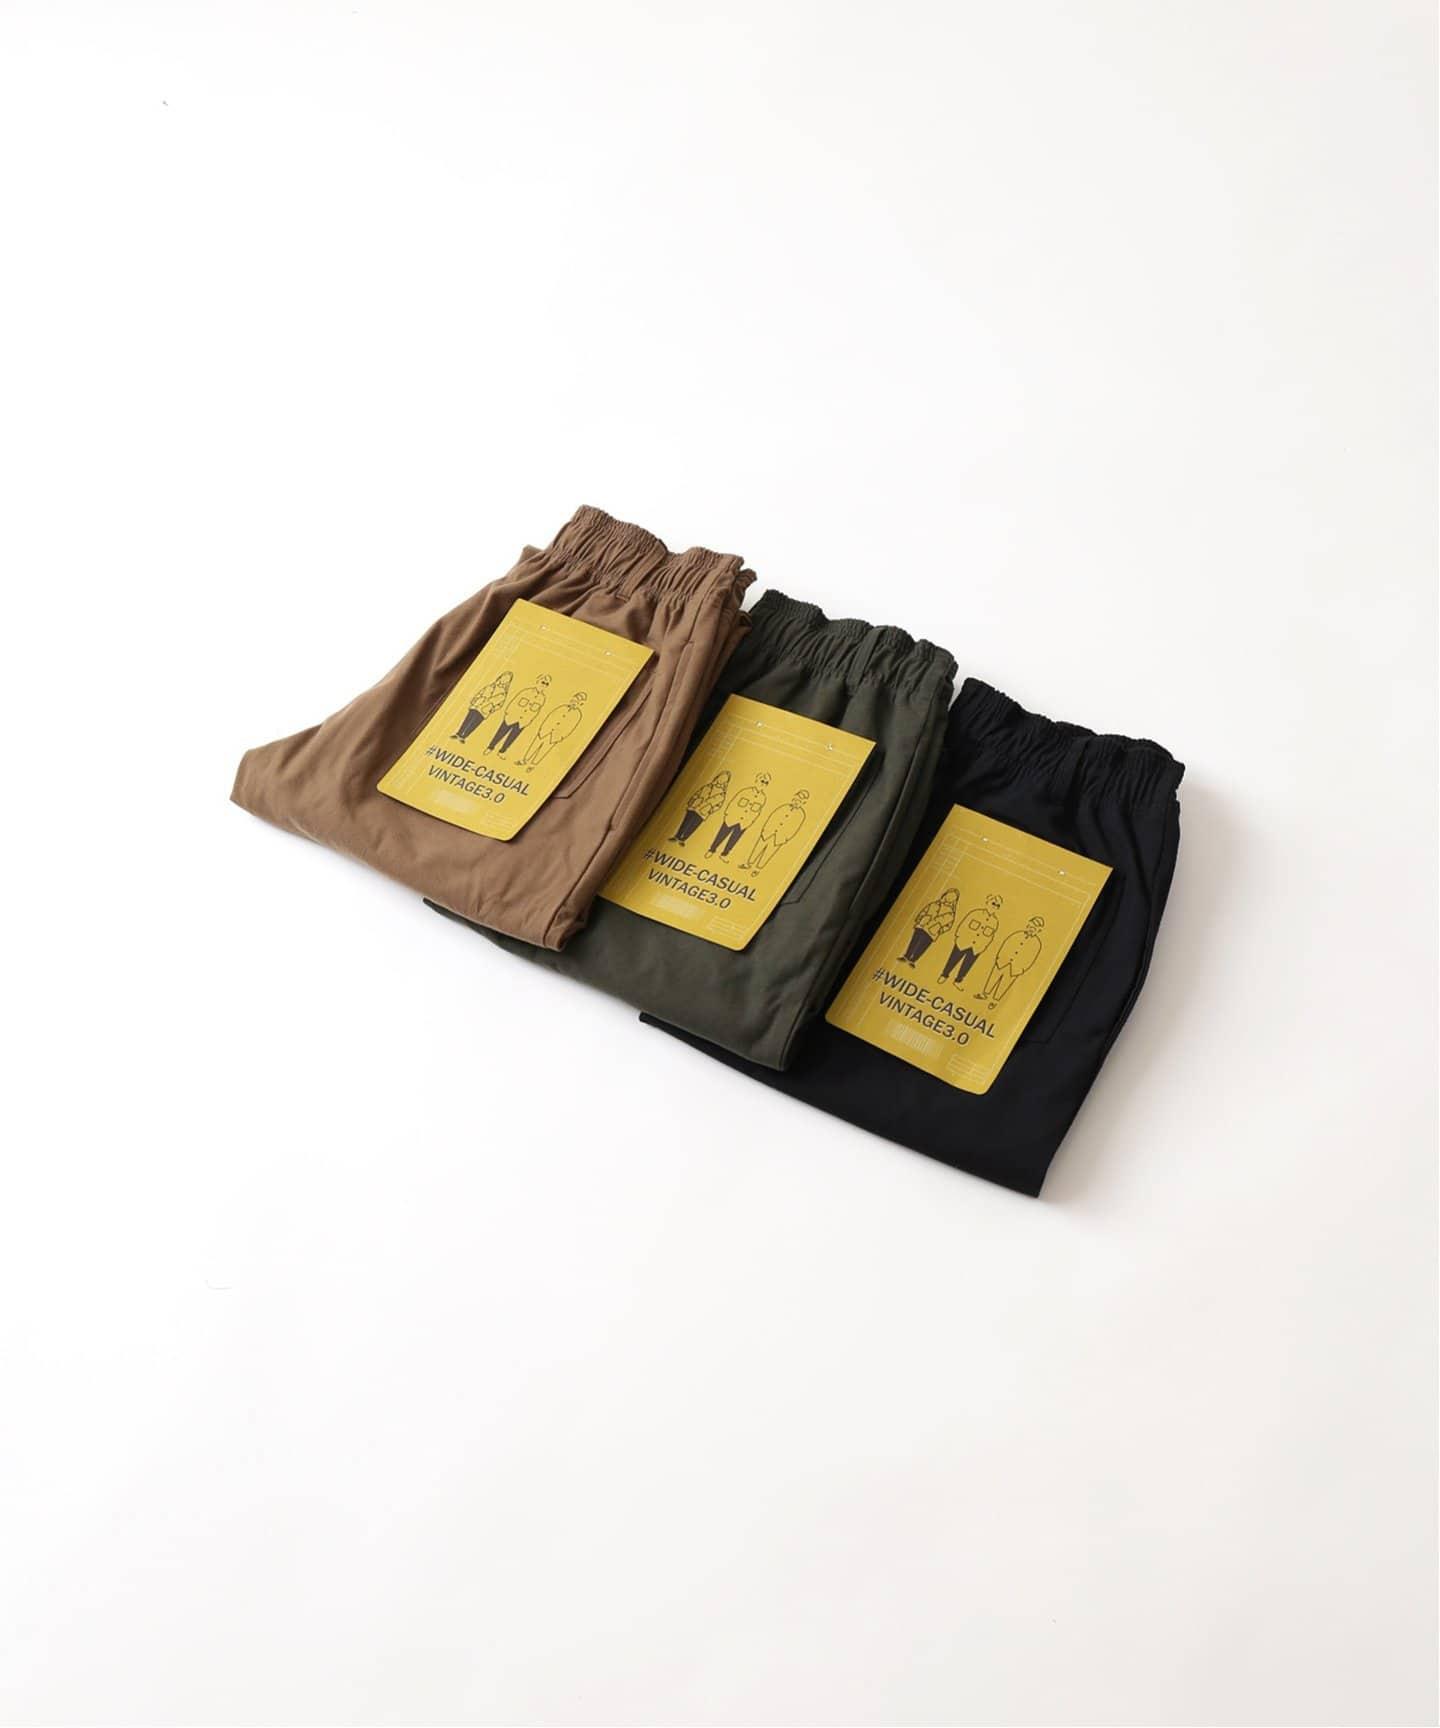 B.C STOCKのパンツ・ズボン/パンツ・ズボン全般|ゴールド